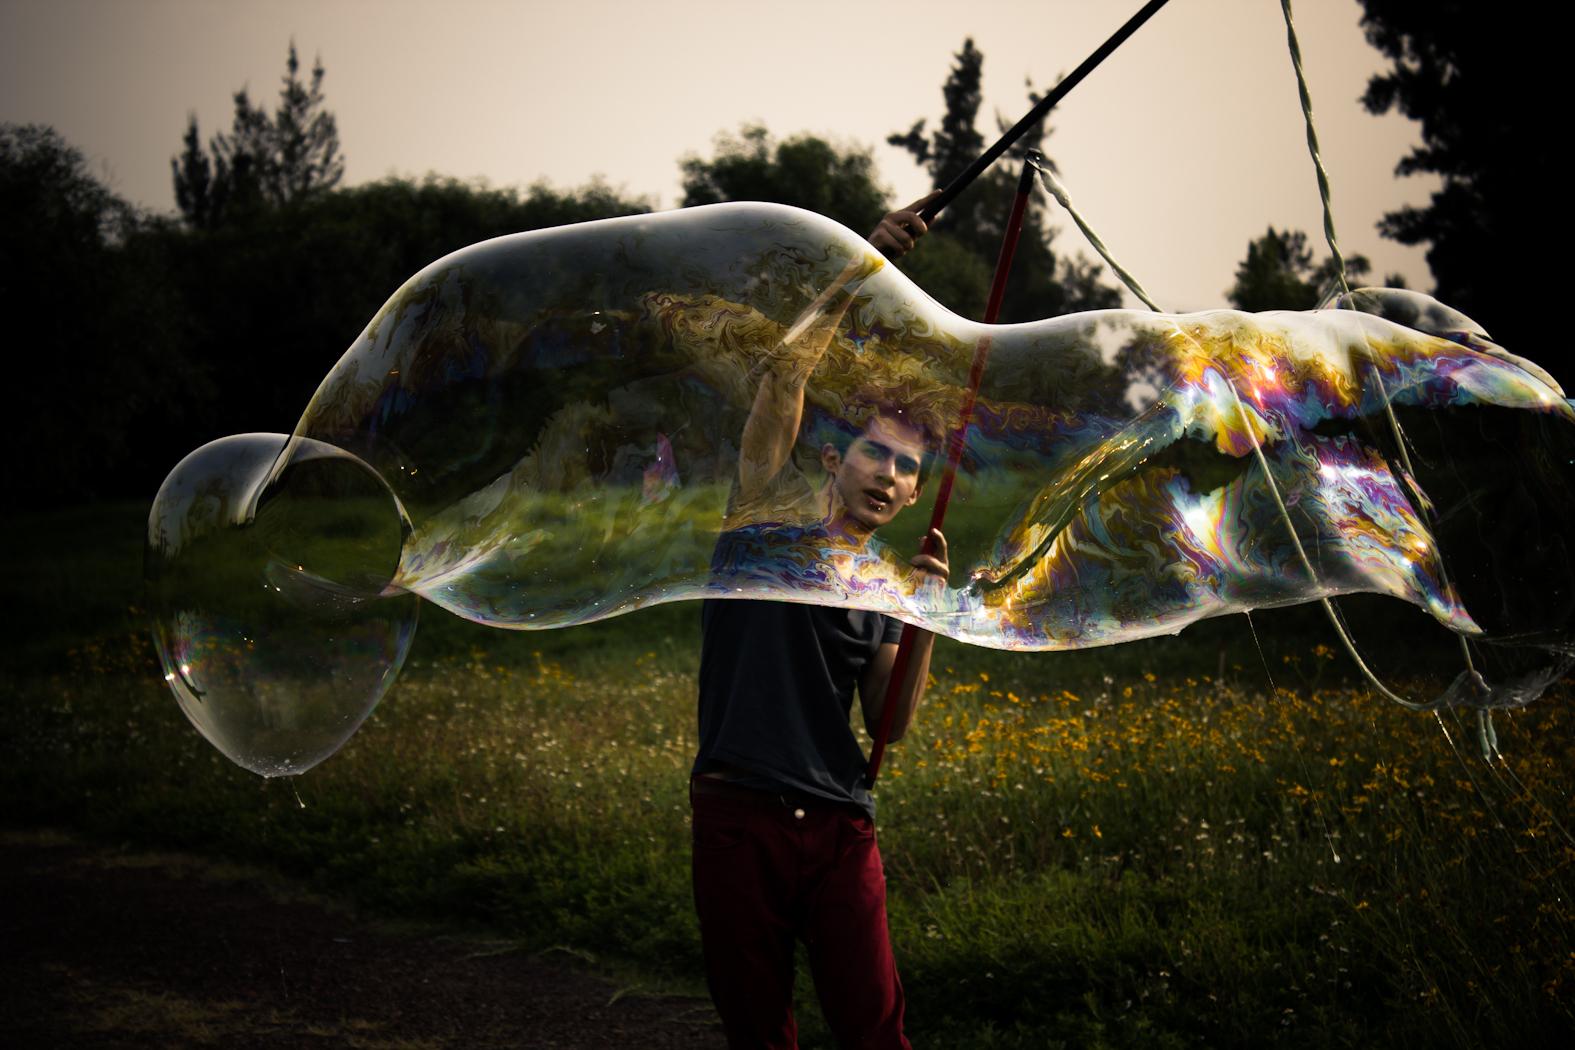 Burbujas enormes